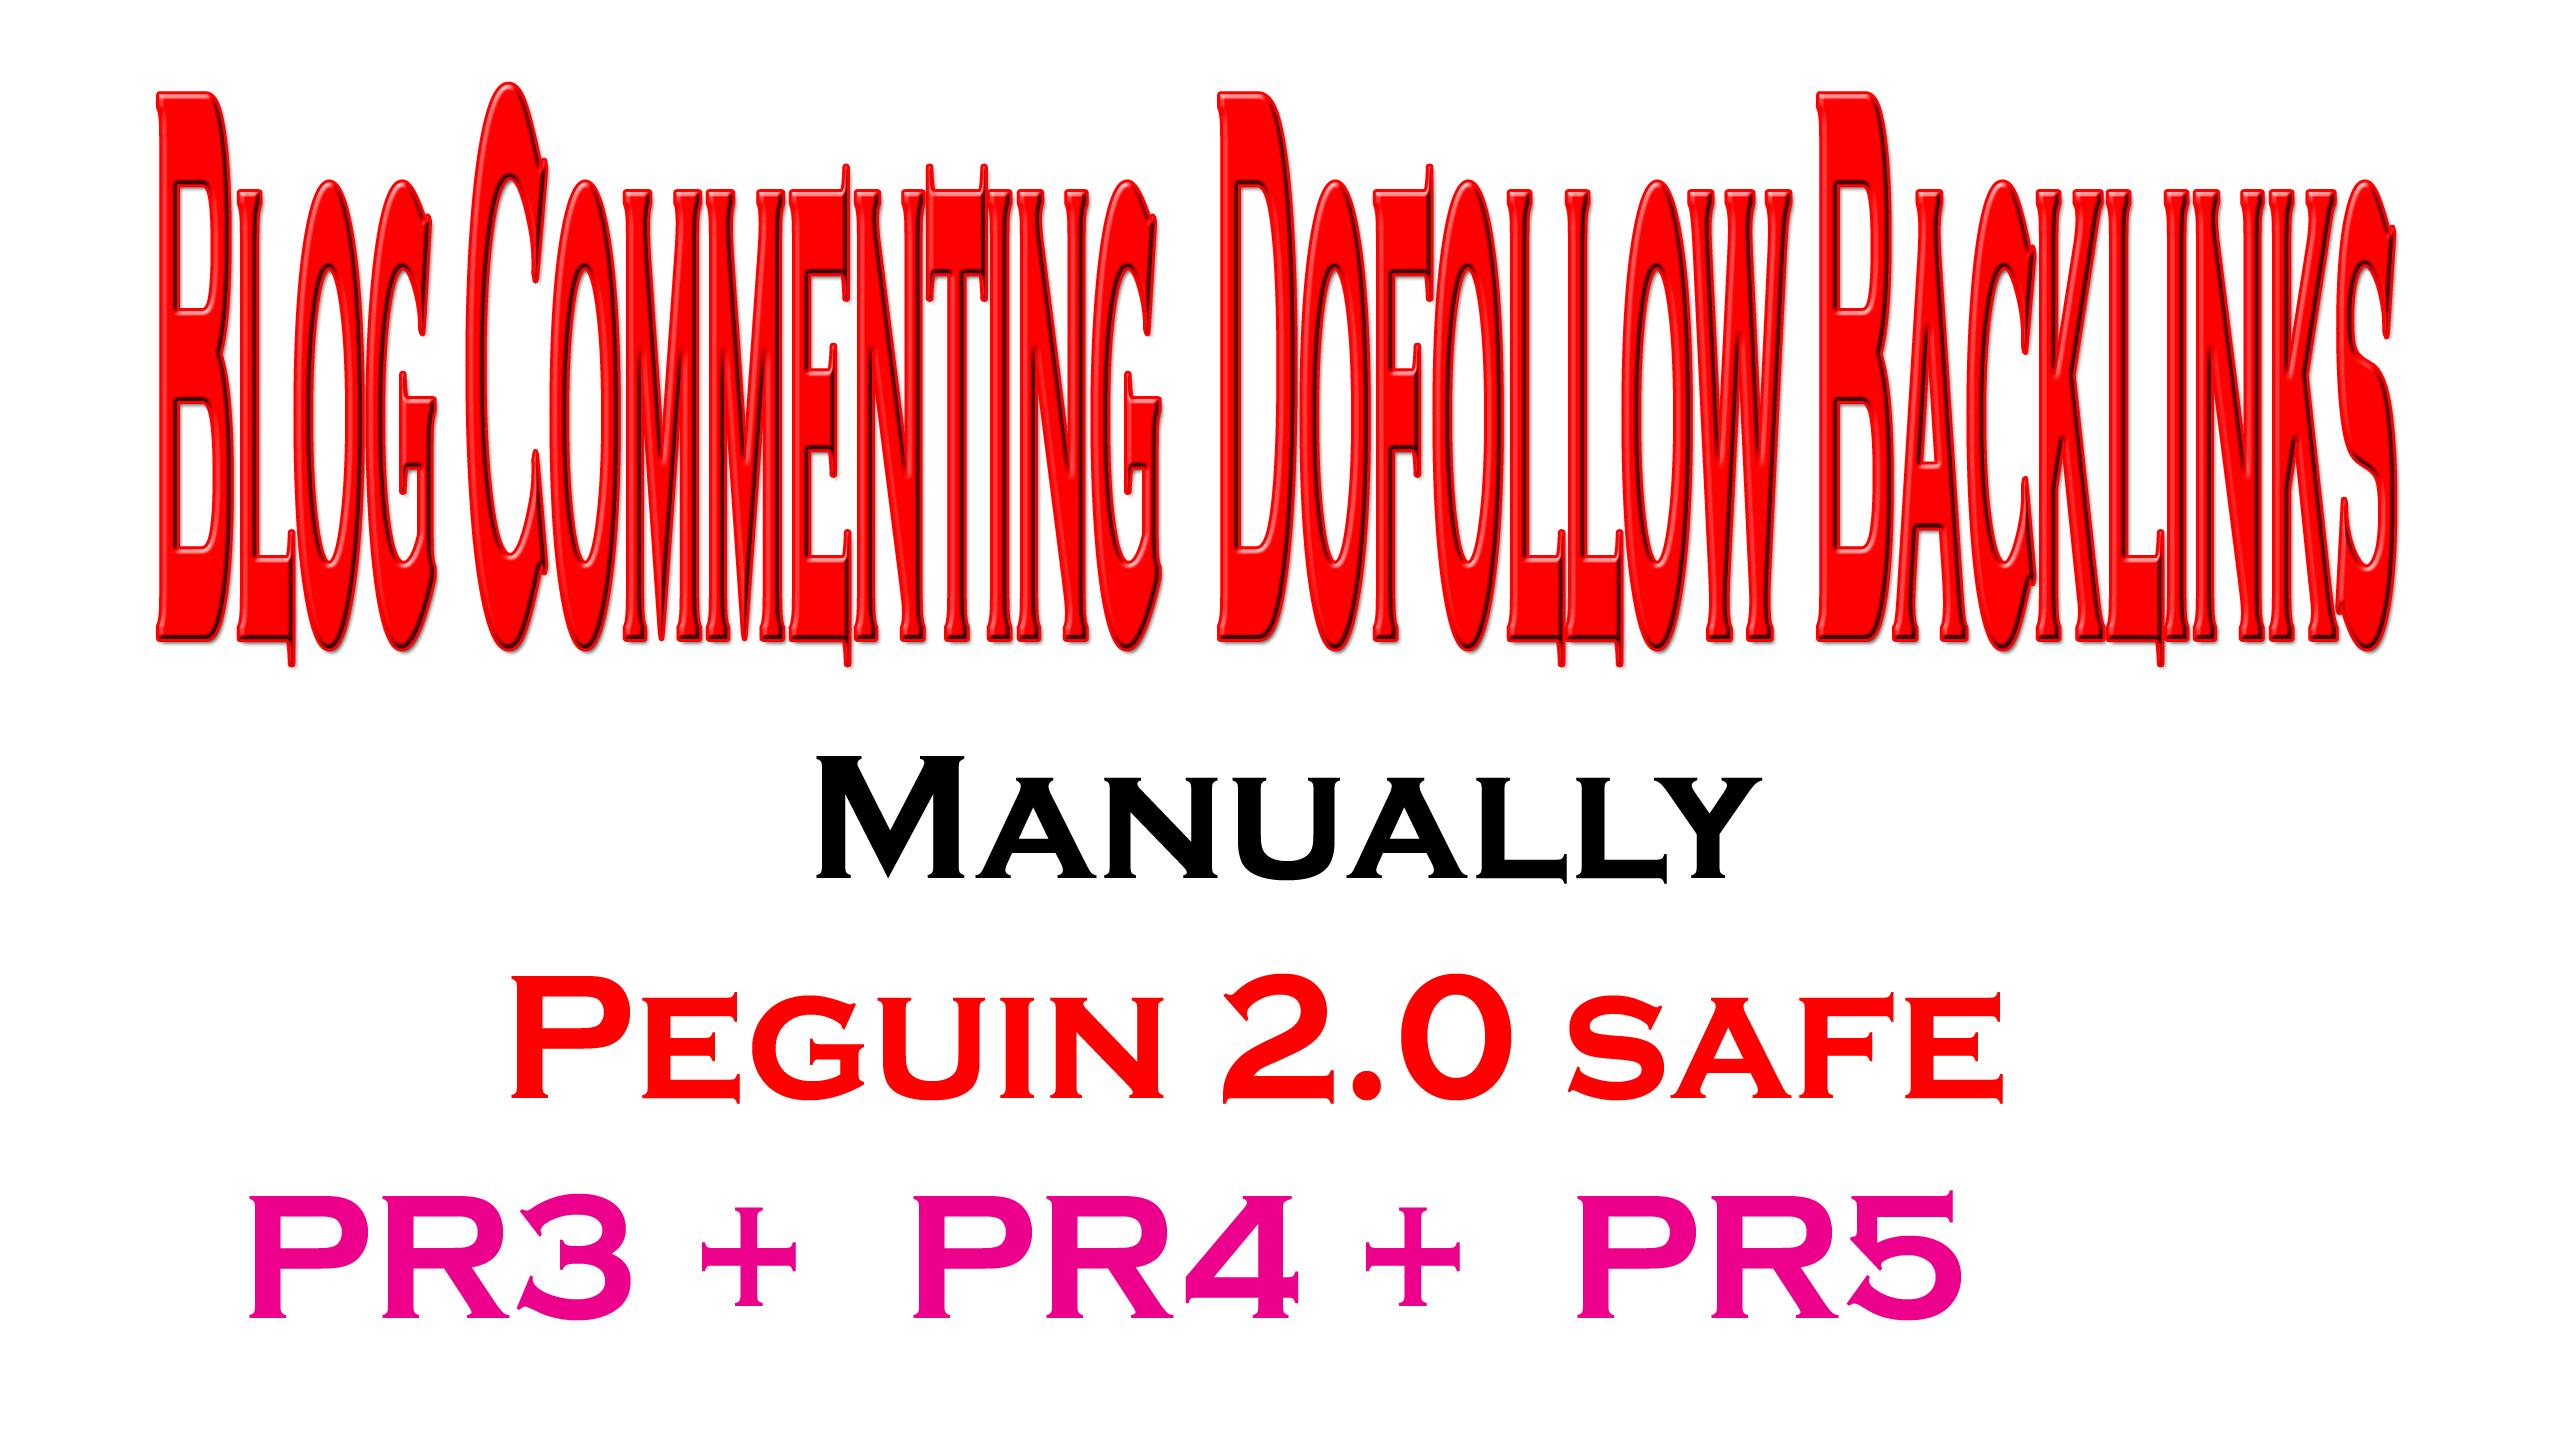 Get Manually Peguin 2.0 safe 5 PR3 + 5 PR4 + 5 PR5 Blog Commenting 100 Dofollow Backlinks